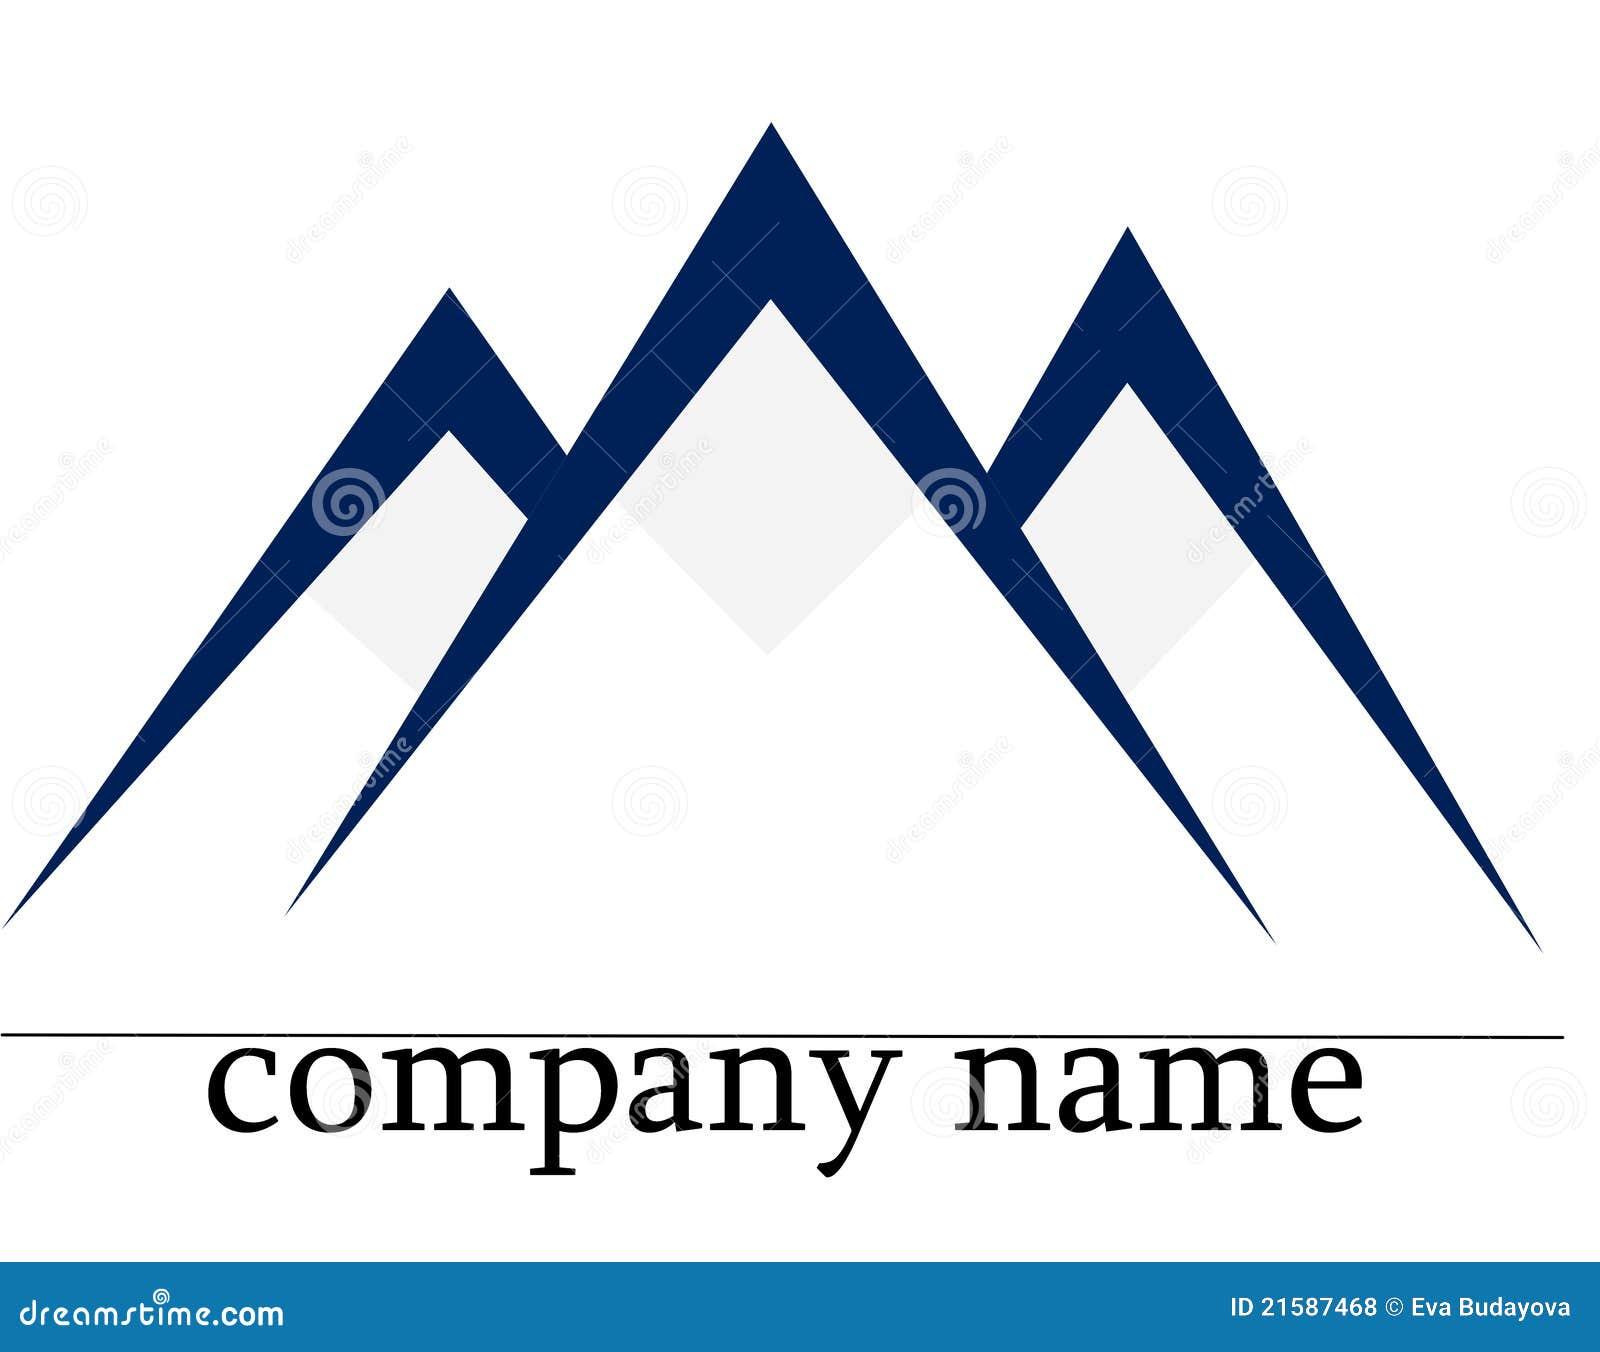 Ice mountain logo stock illustration. Image of icon, logo ...